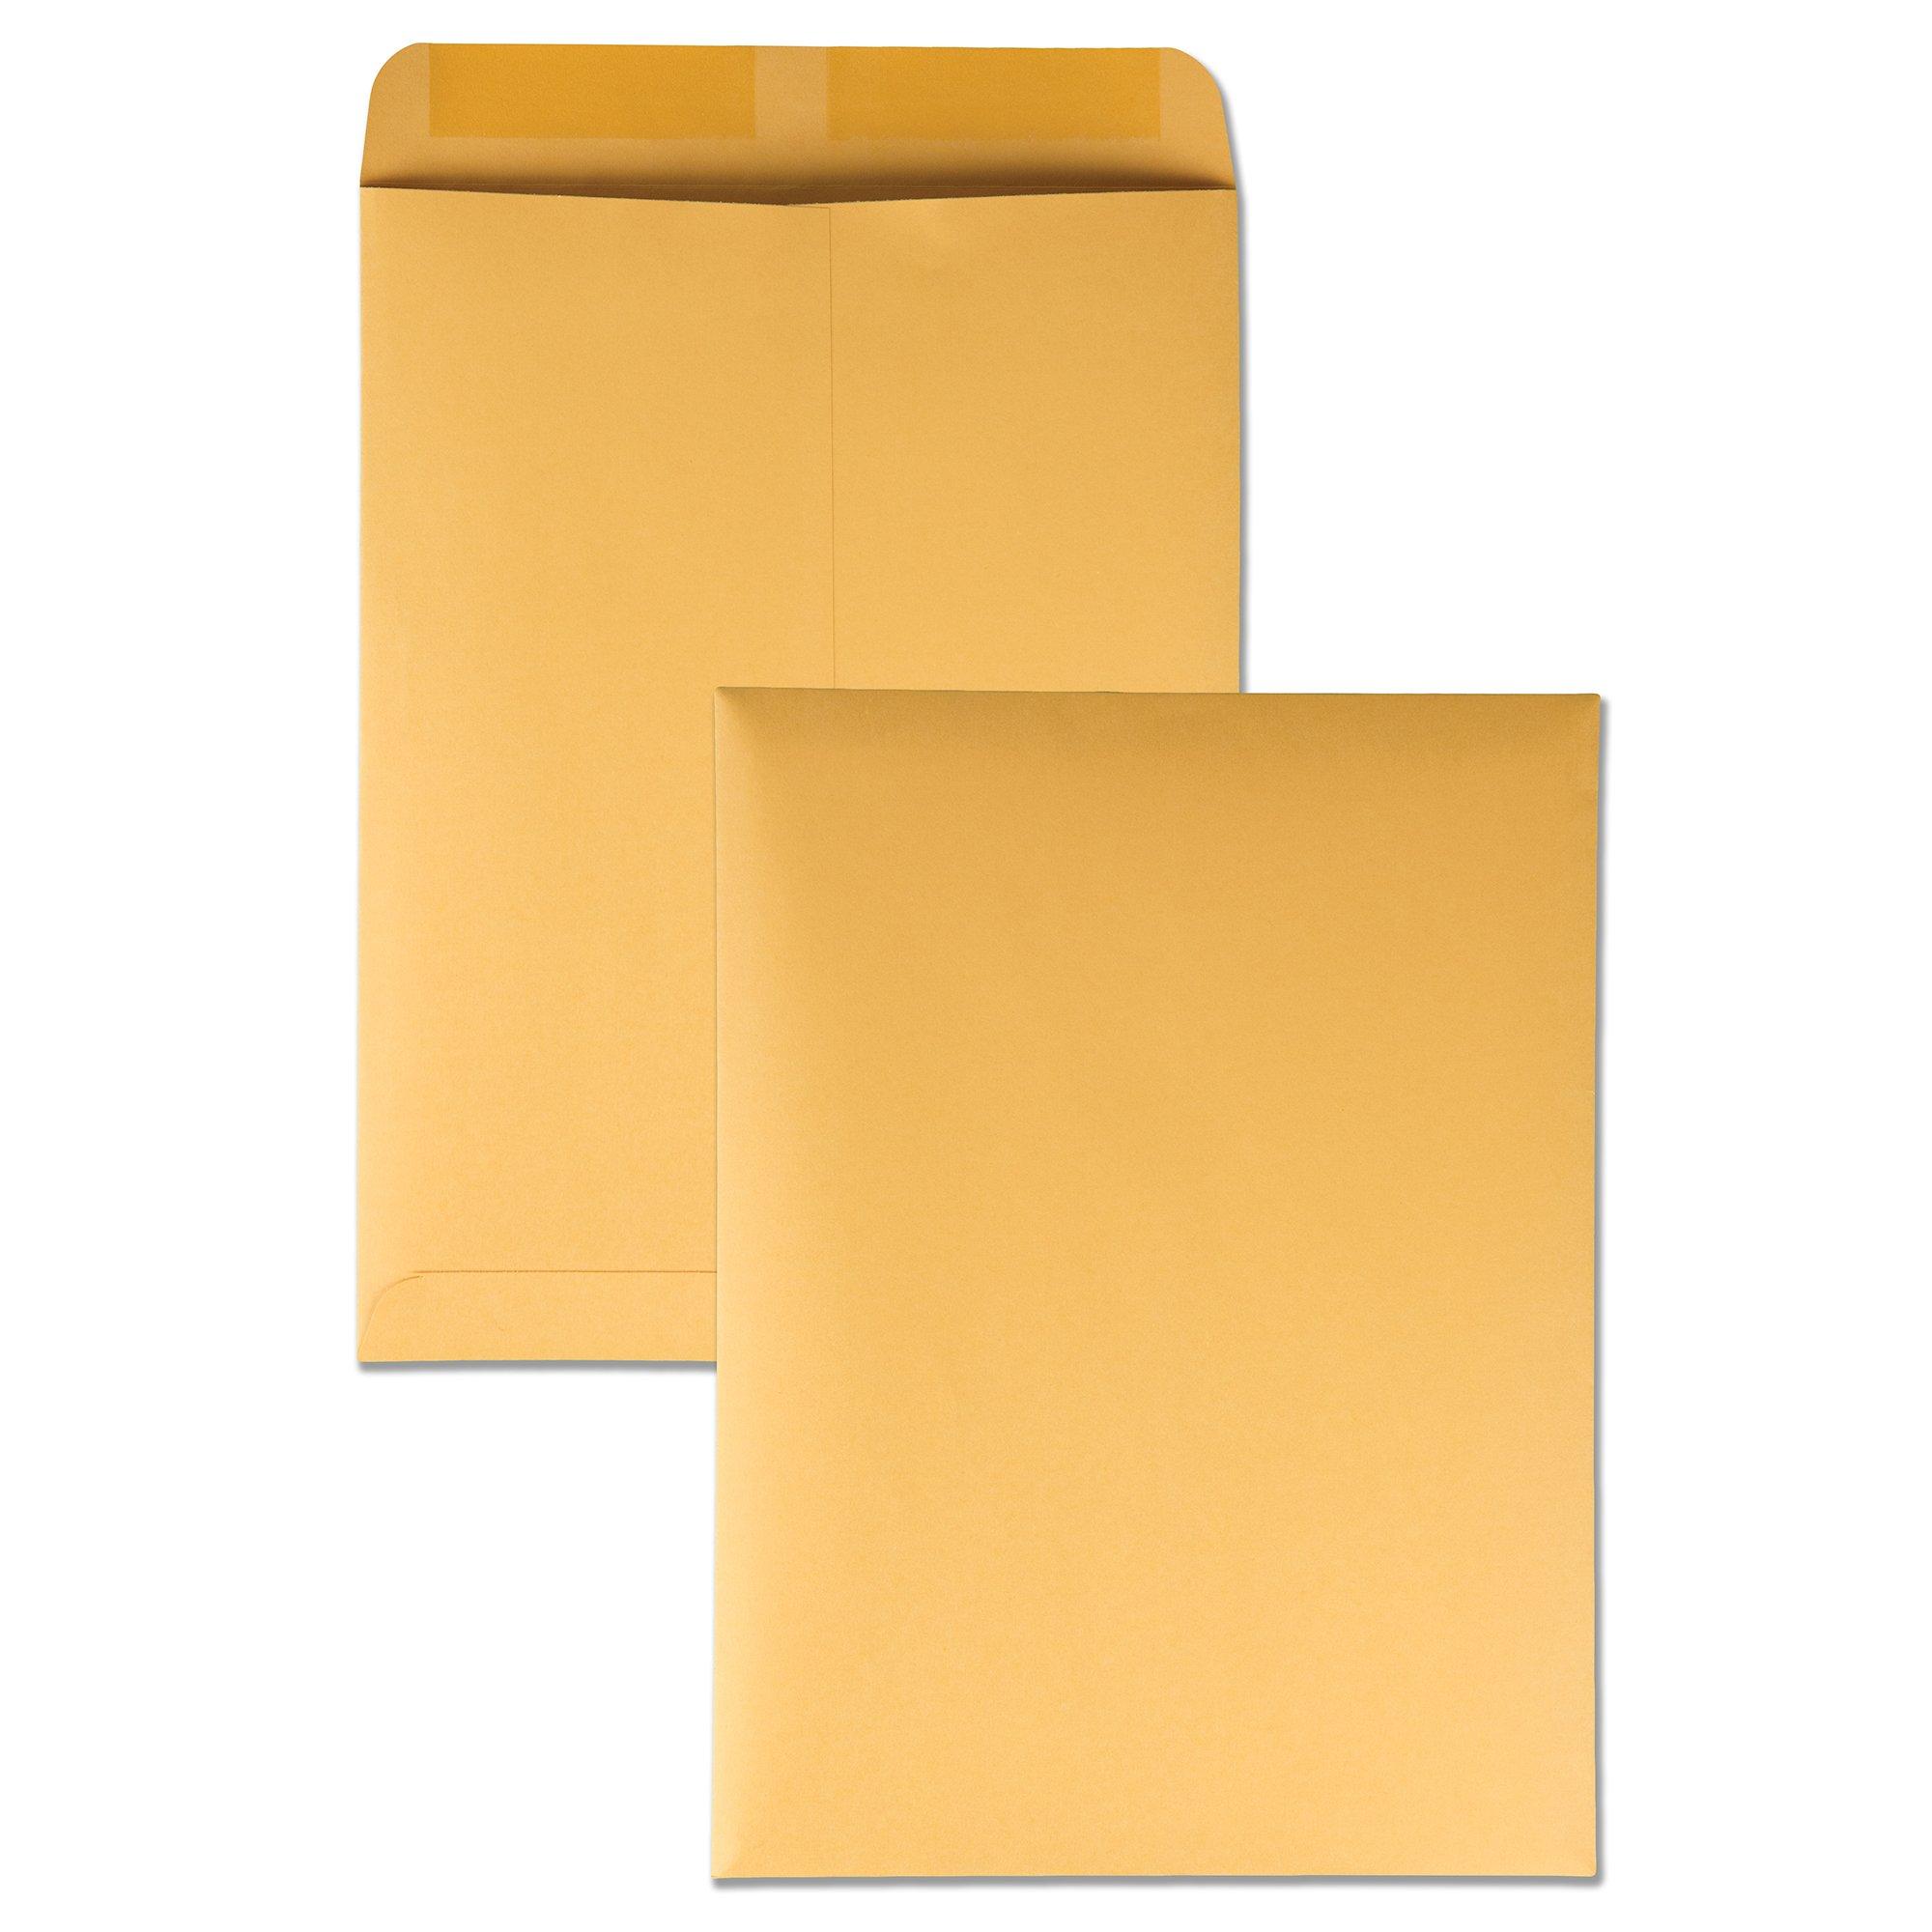 Quality Park 41665 Quality Park Catalog Envelopes, Heavyweight/Gummed, 10x13, 28lb, Kraft, 250/Box